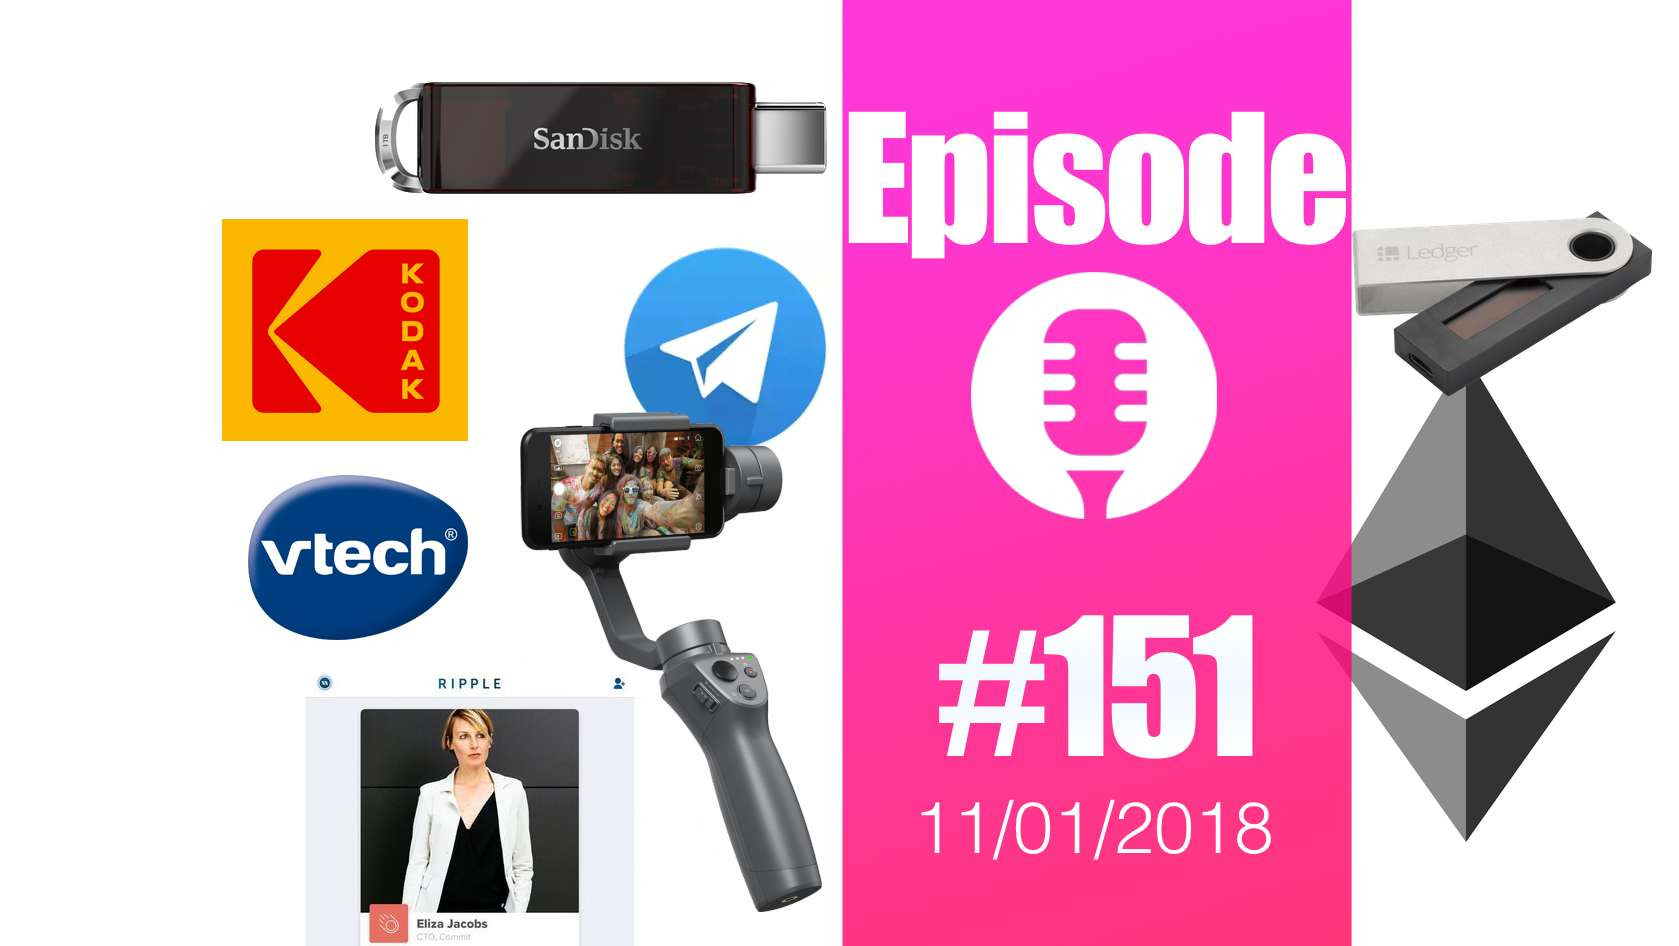 #151: CES 2018, Tinder Ripple, l'ICO de Telegram, Kodak, Galaxy S9 aux MWC, VTech et Darty condamnés,… et Nabilla !